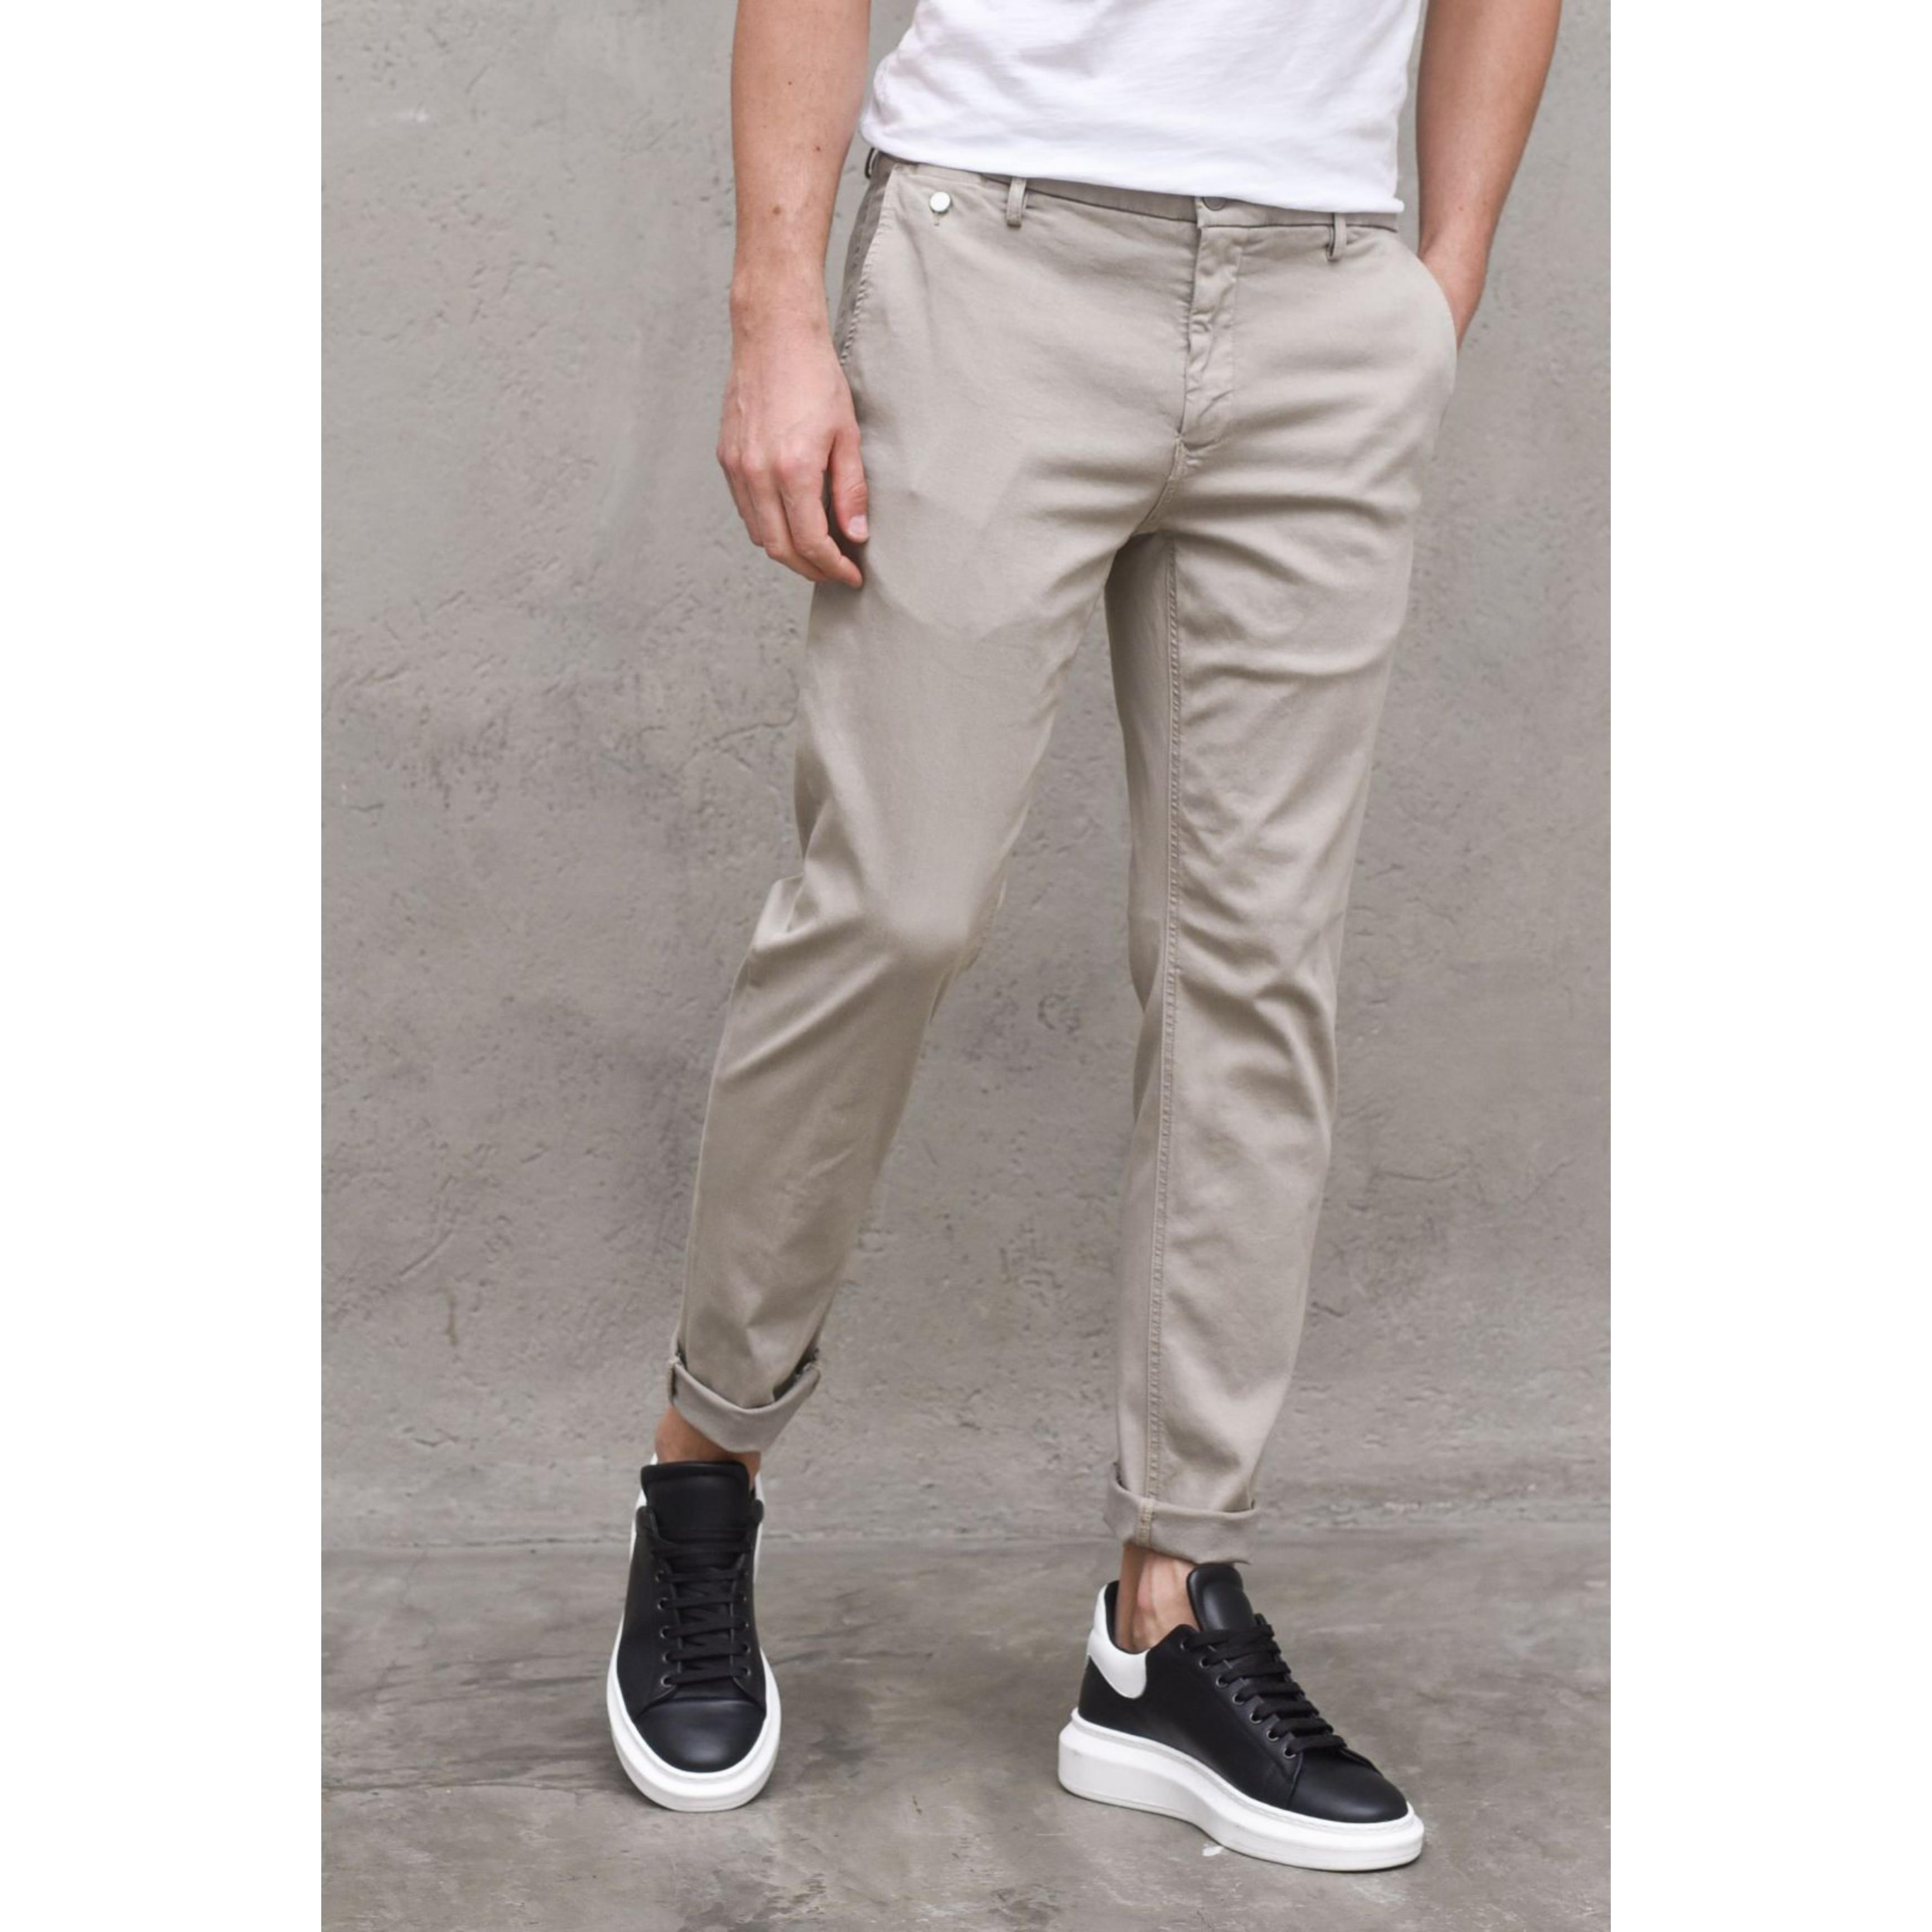 LA CASA Slim Fit Oatmeal Chinos for Men - Casual Cotton Pant